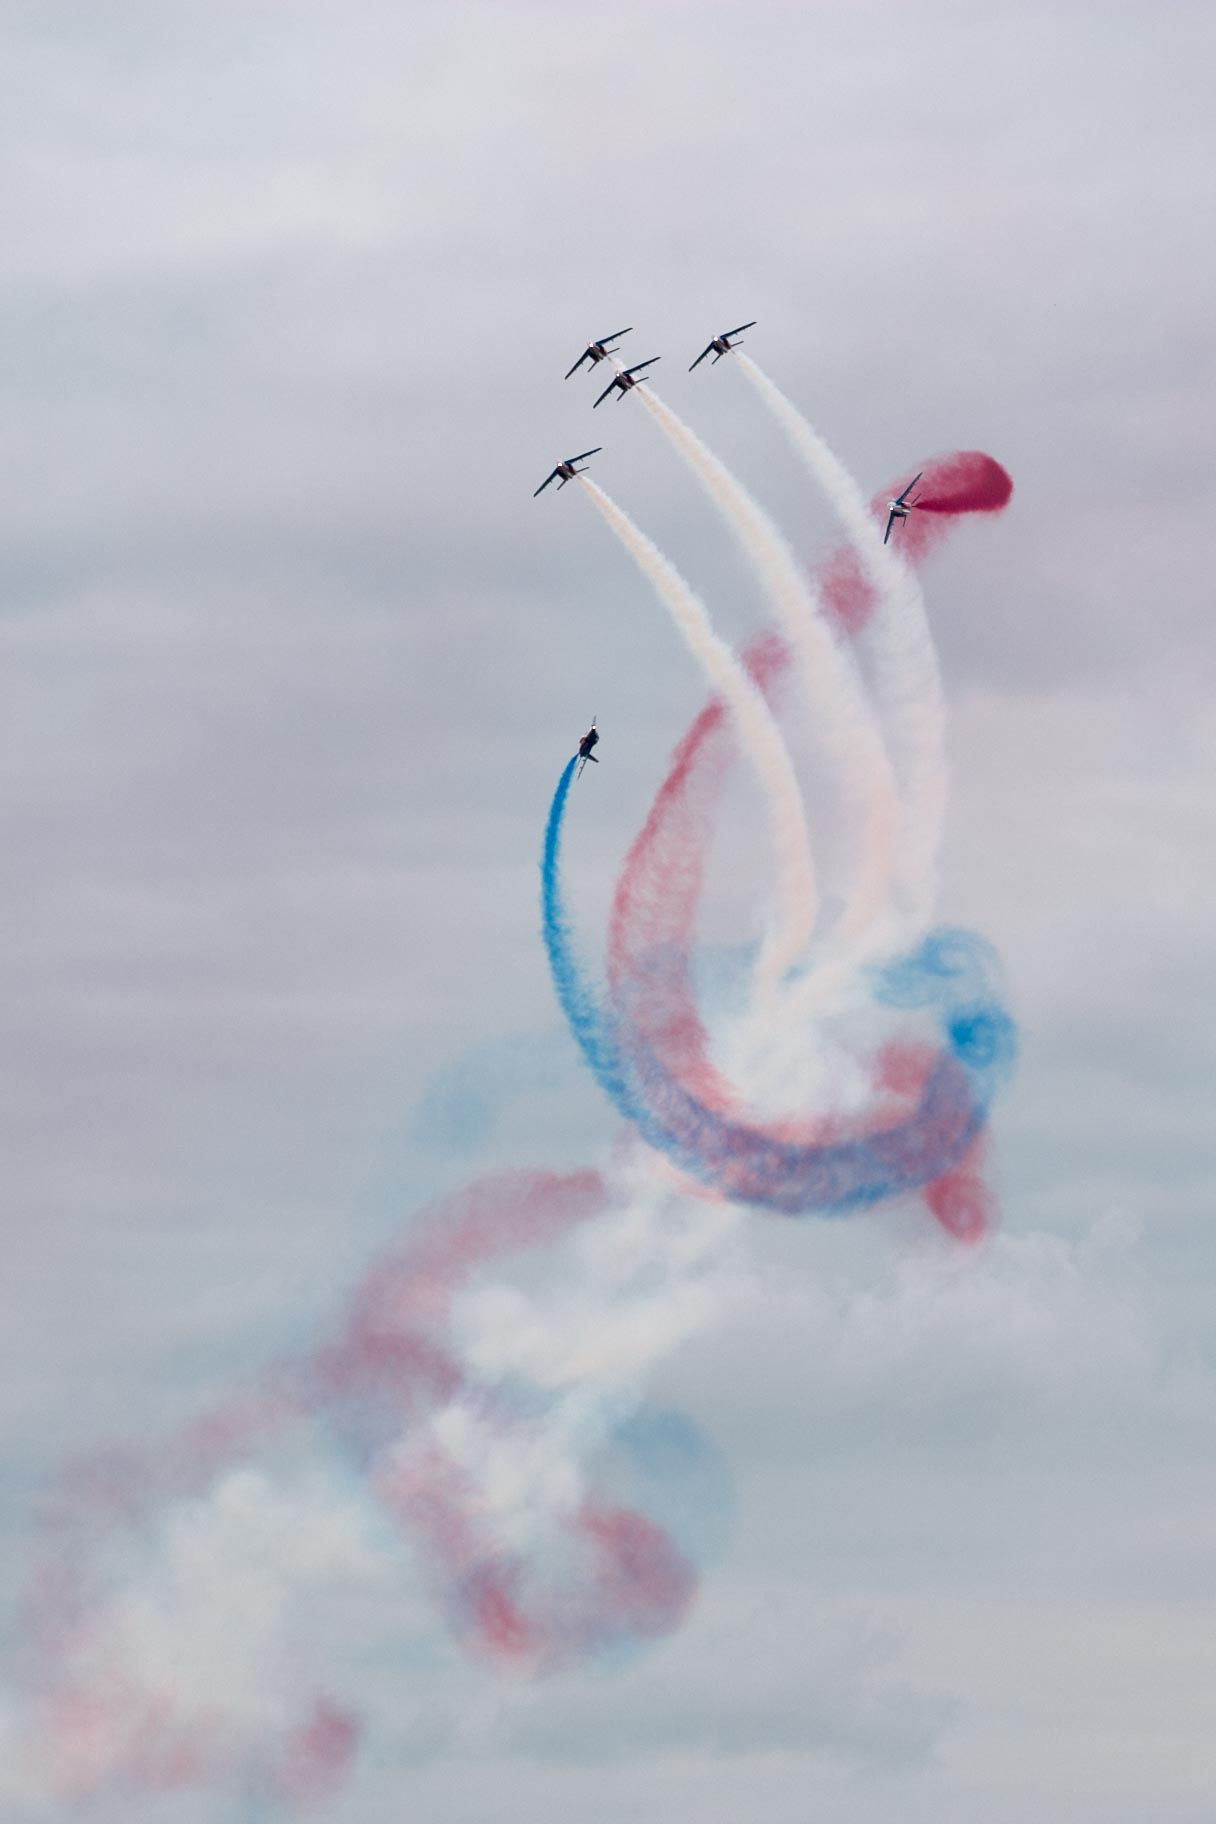 1-Couleur-Tourbillon Bleu Blanc Rouge (MG_6364)